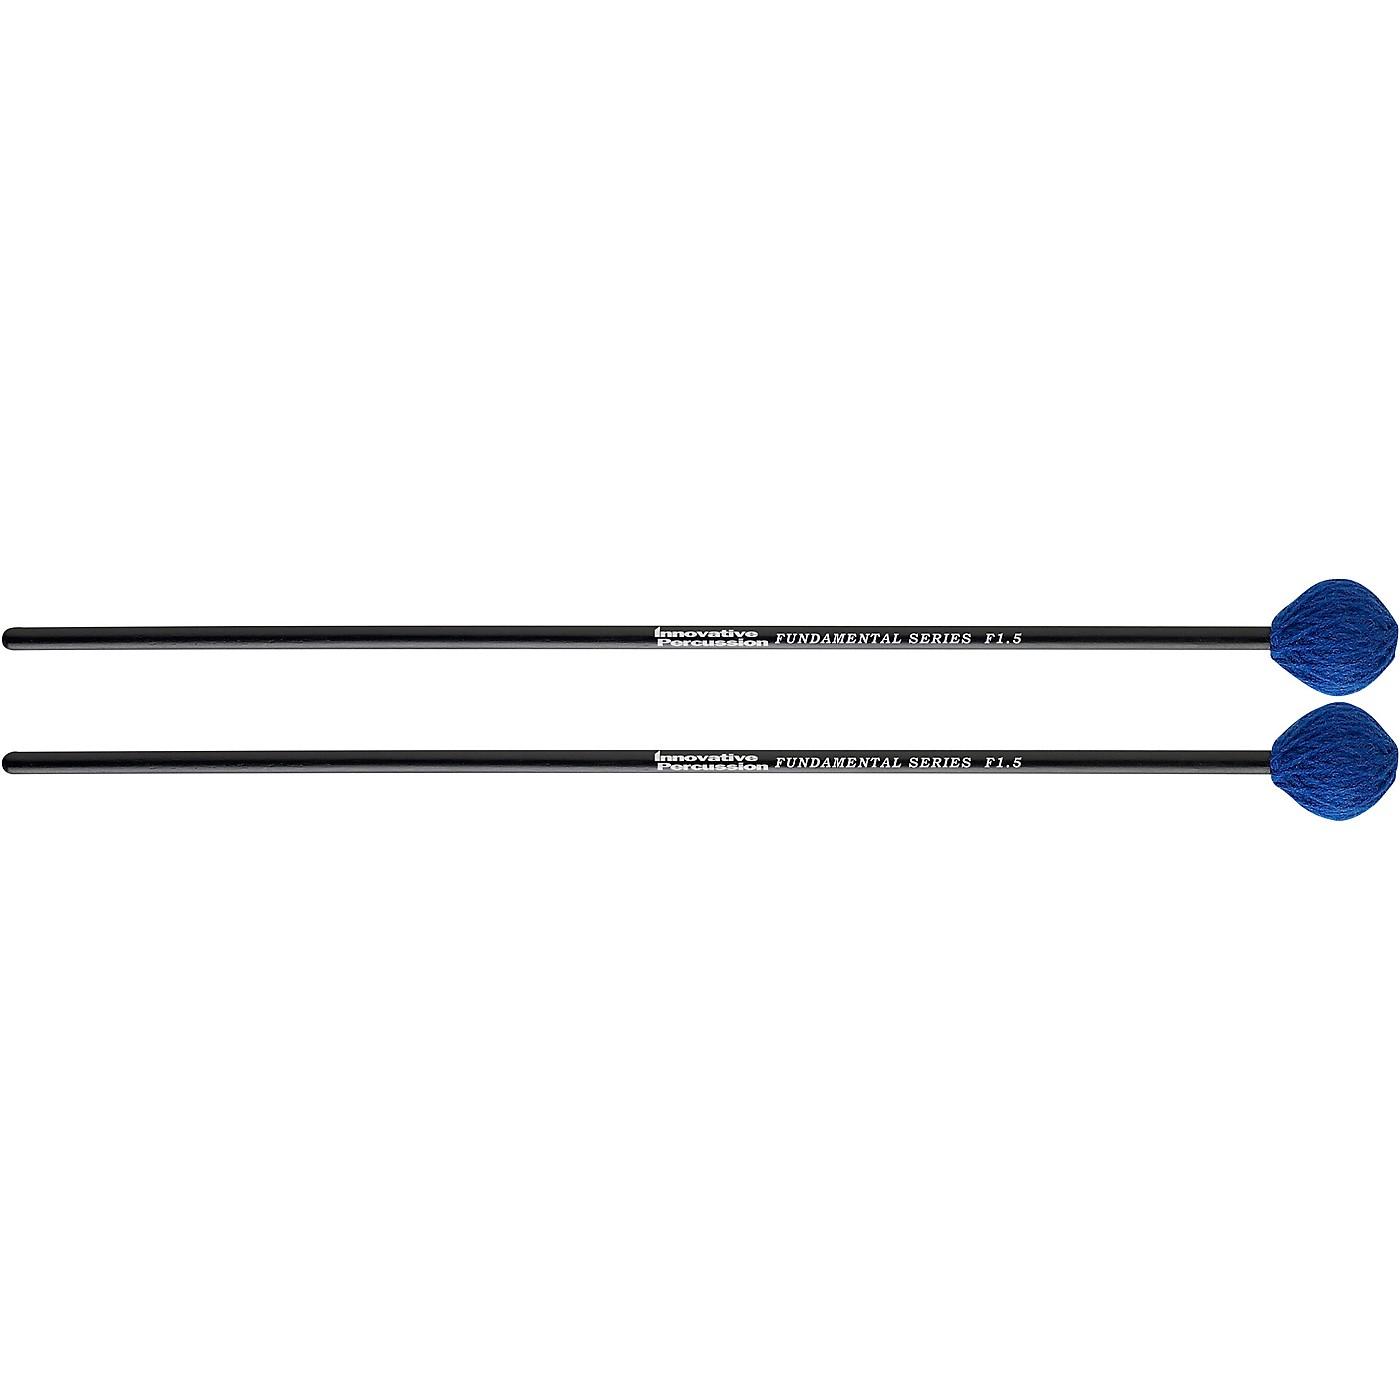 Innovative Percussion Fundamental Series Medium-Soft Marimba Mallet thumbnail